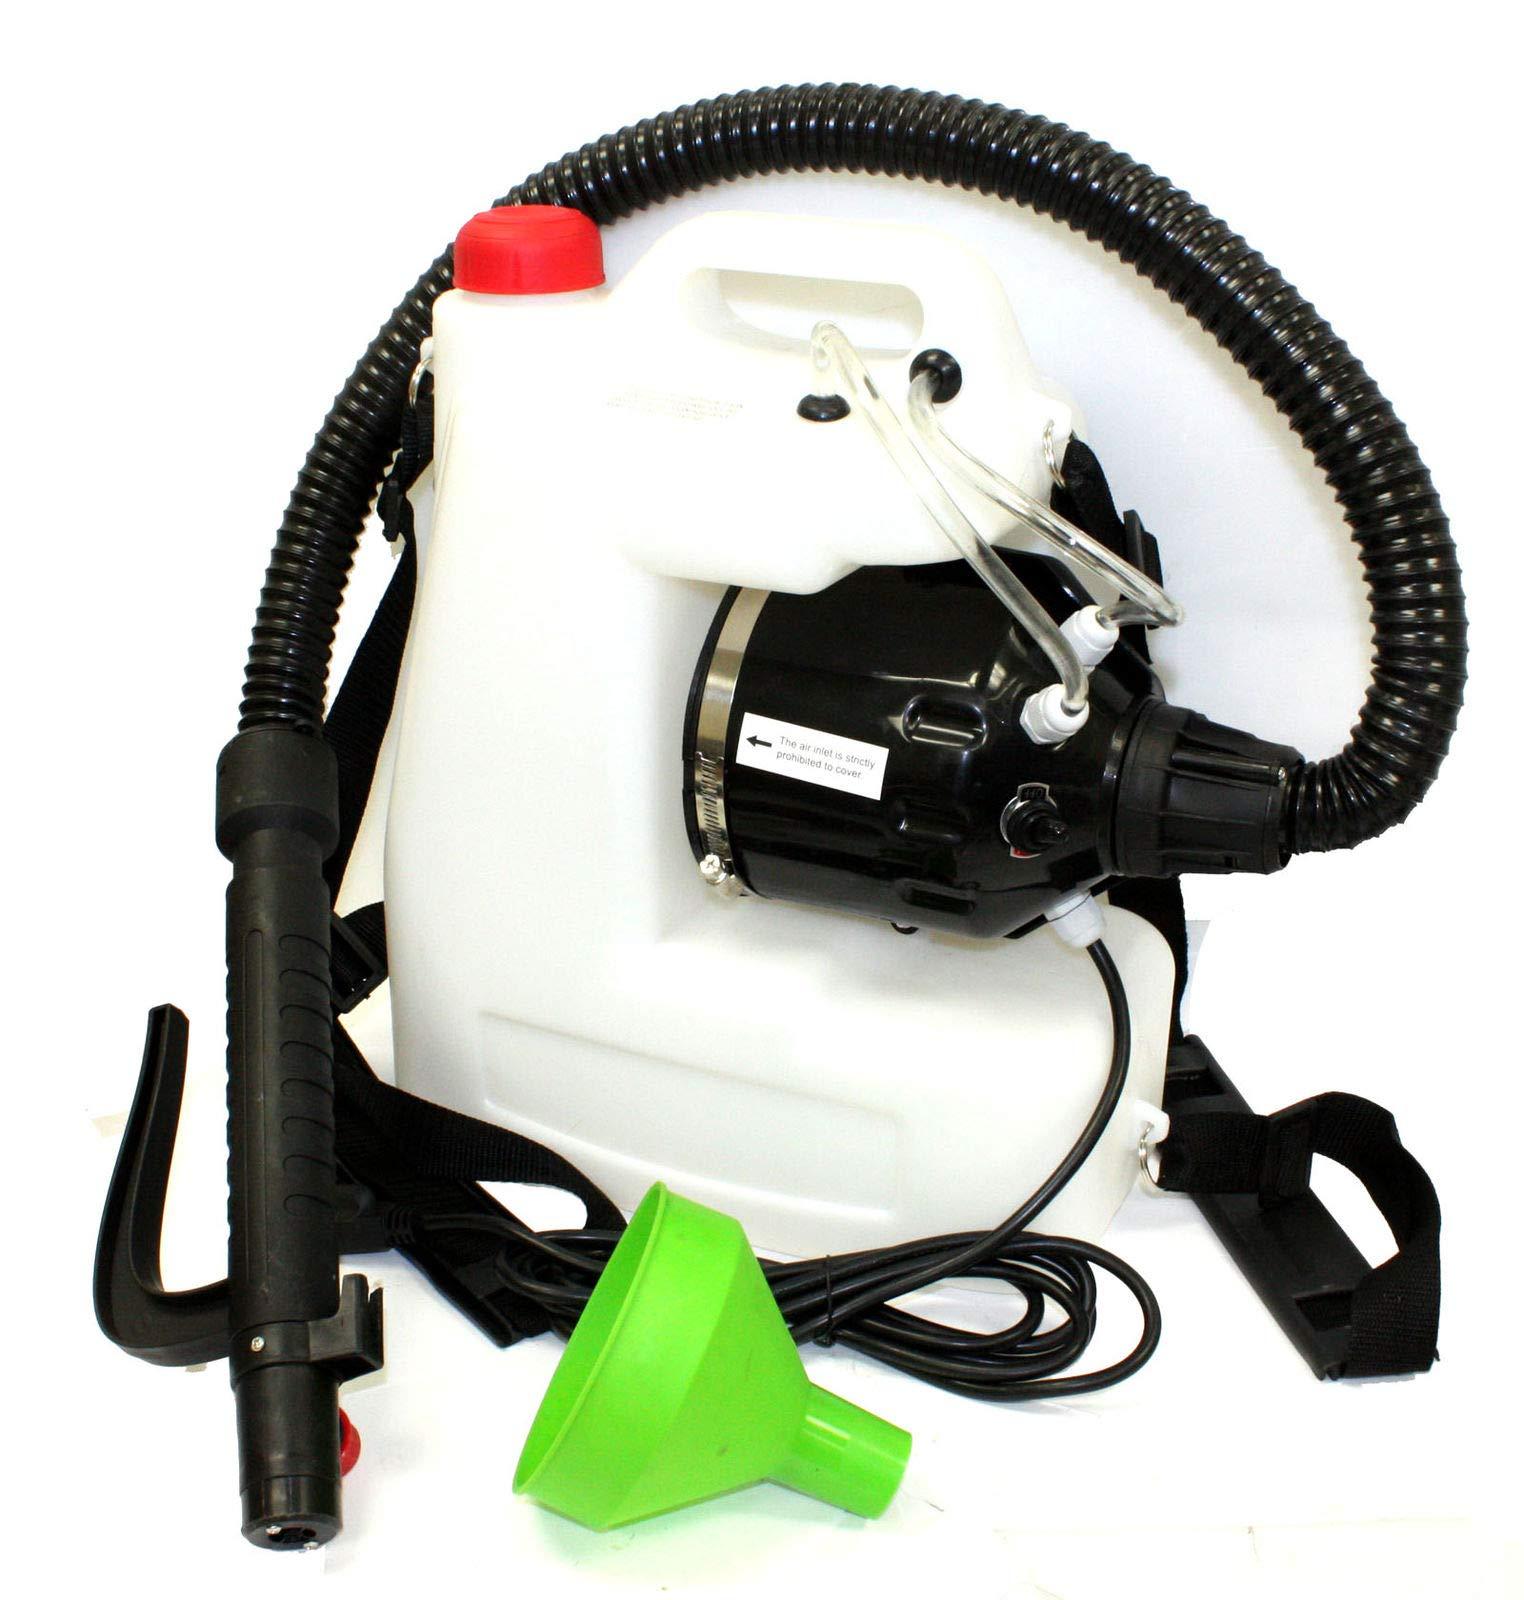 M2 Outlet 12L 1200W Electric ULV Mist Blower Sprayer Sanitation Disinfection Pest Control